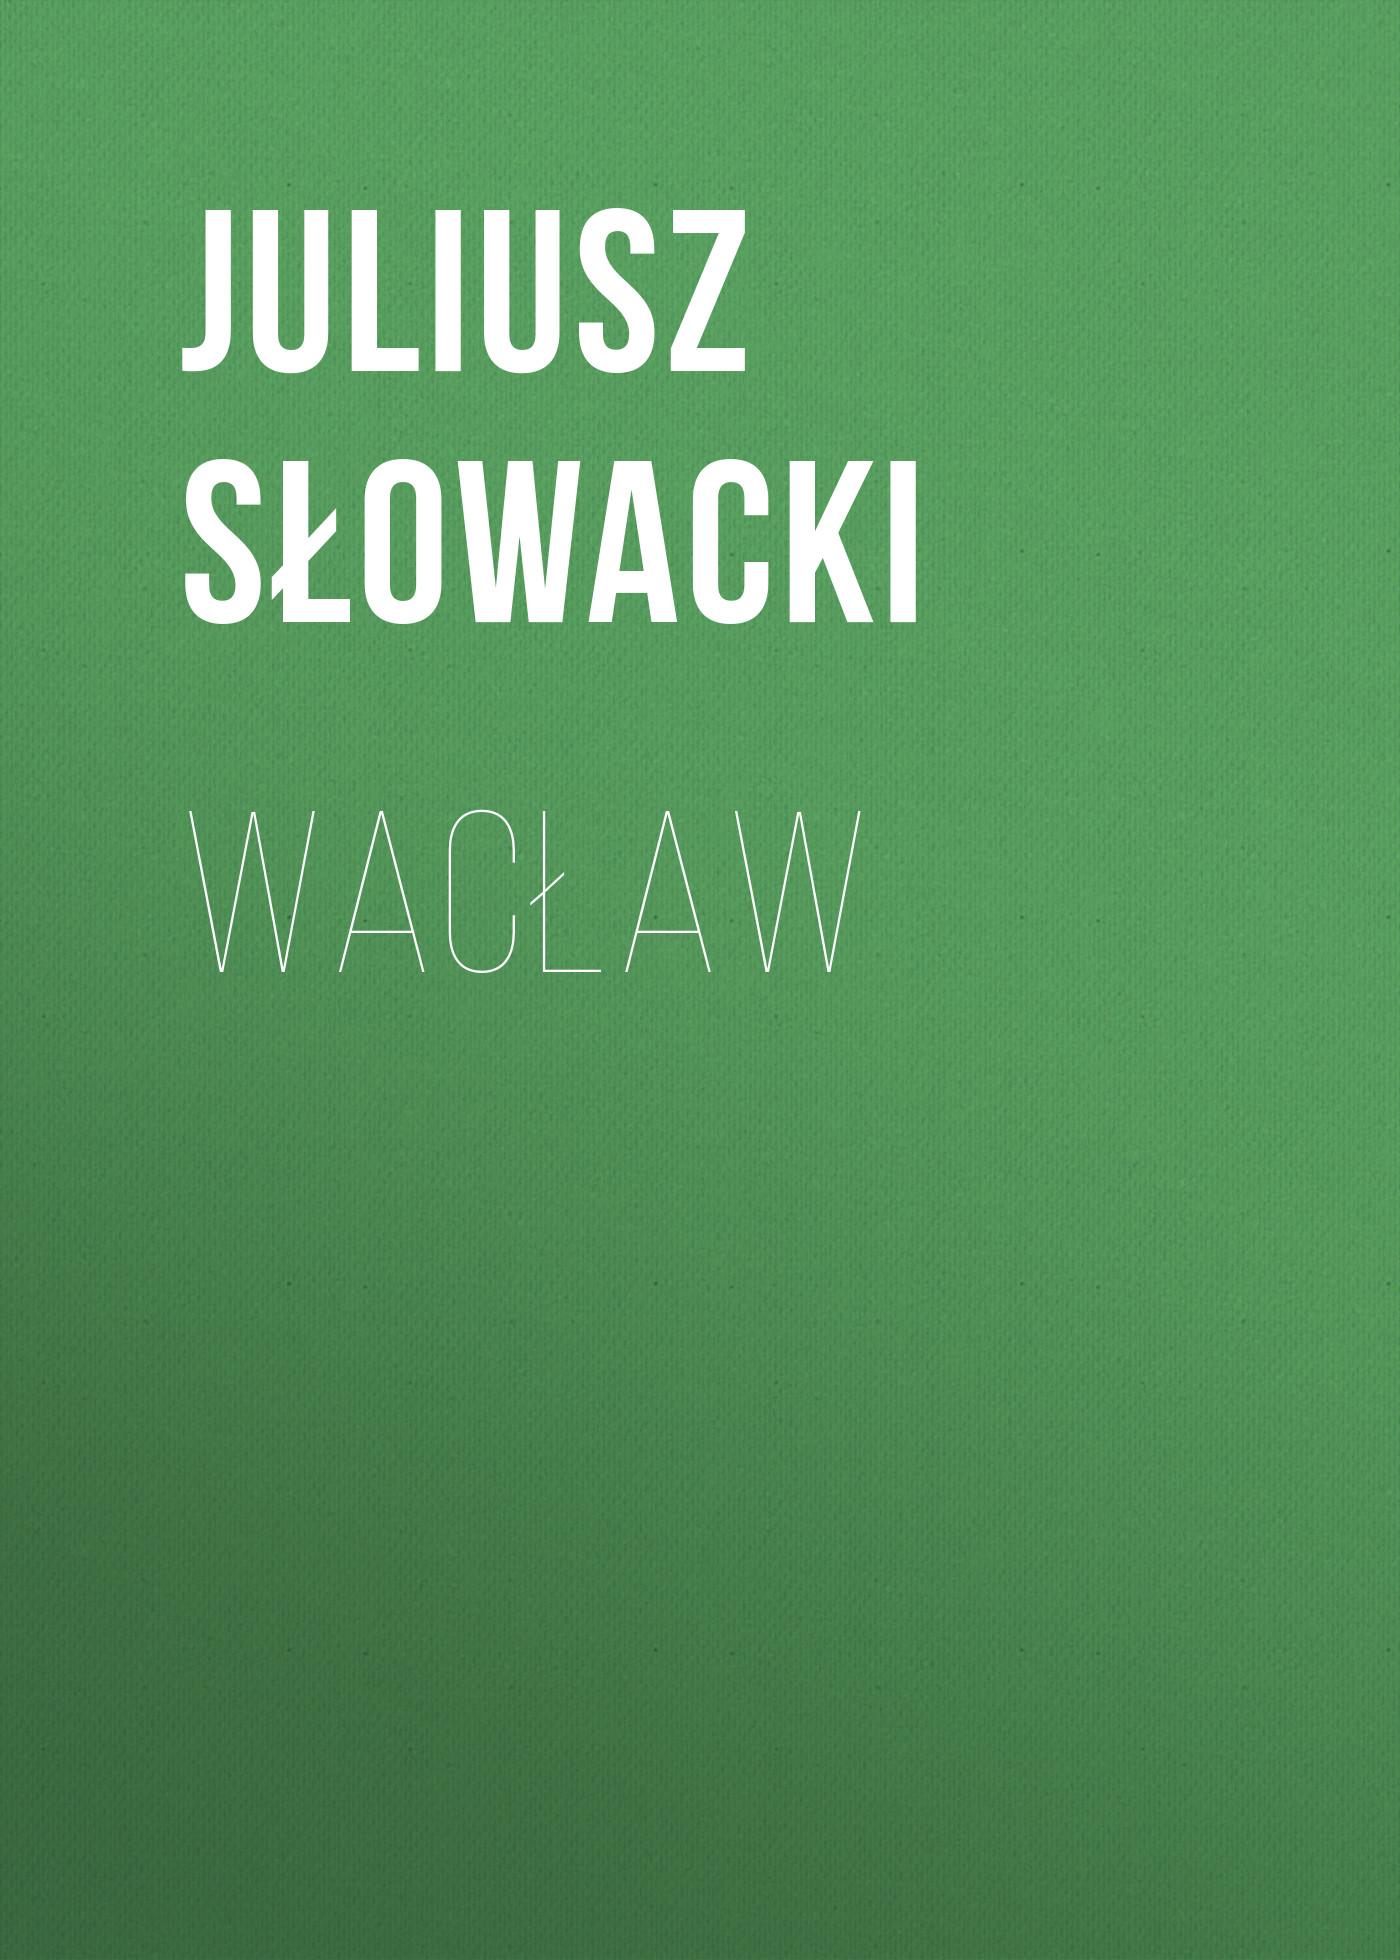 Wacław